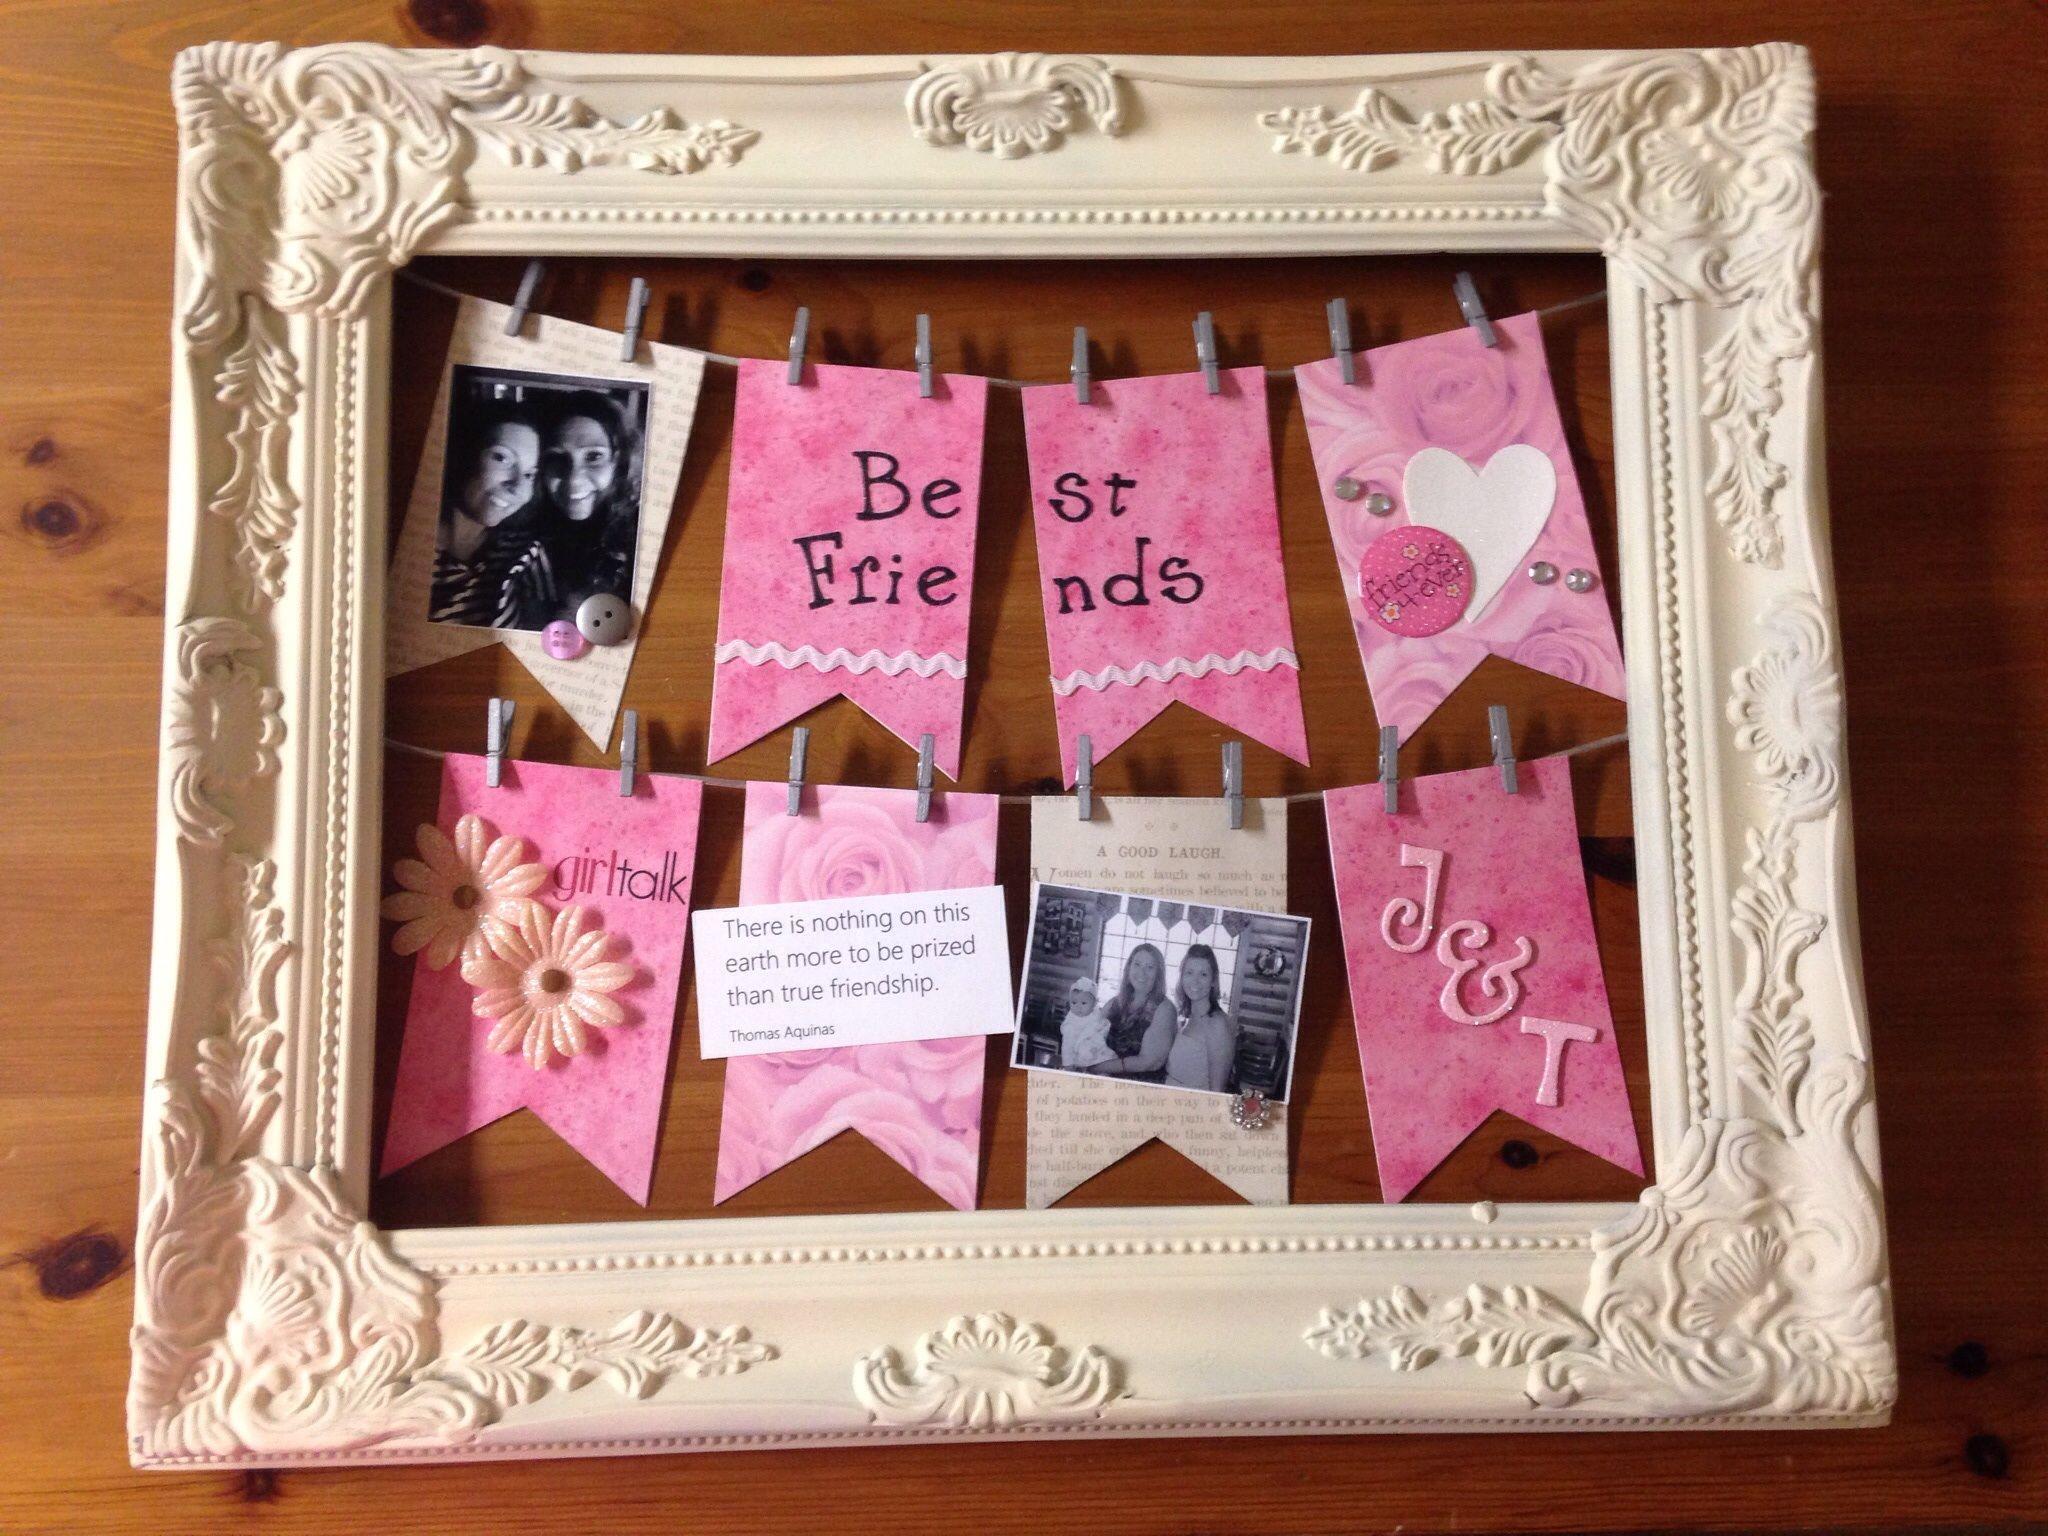 Best friend scrapbook ideas - Best Friend Birthday Gift Scrapbook Com